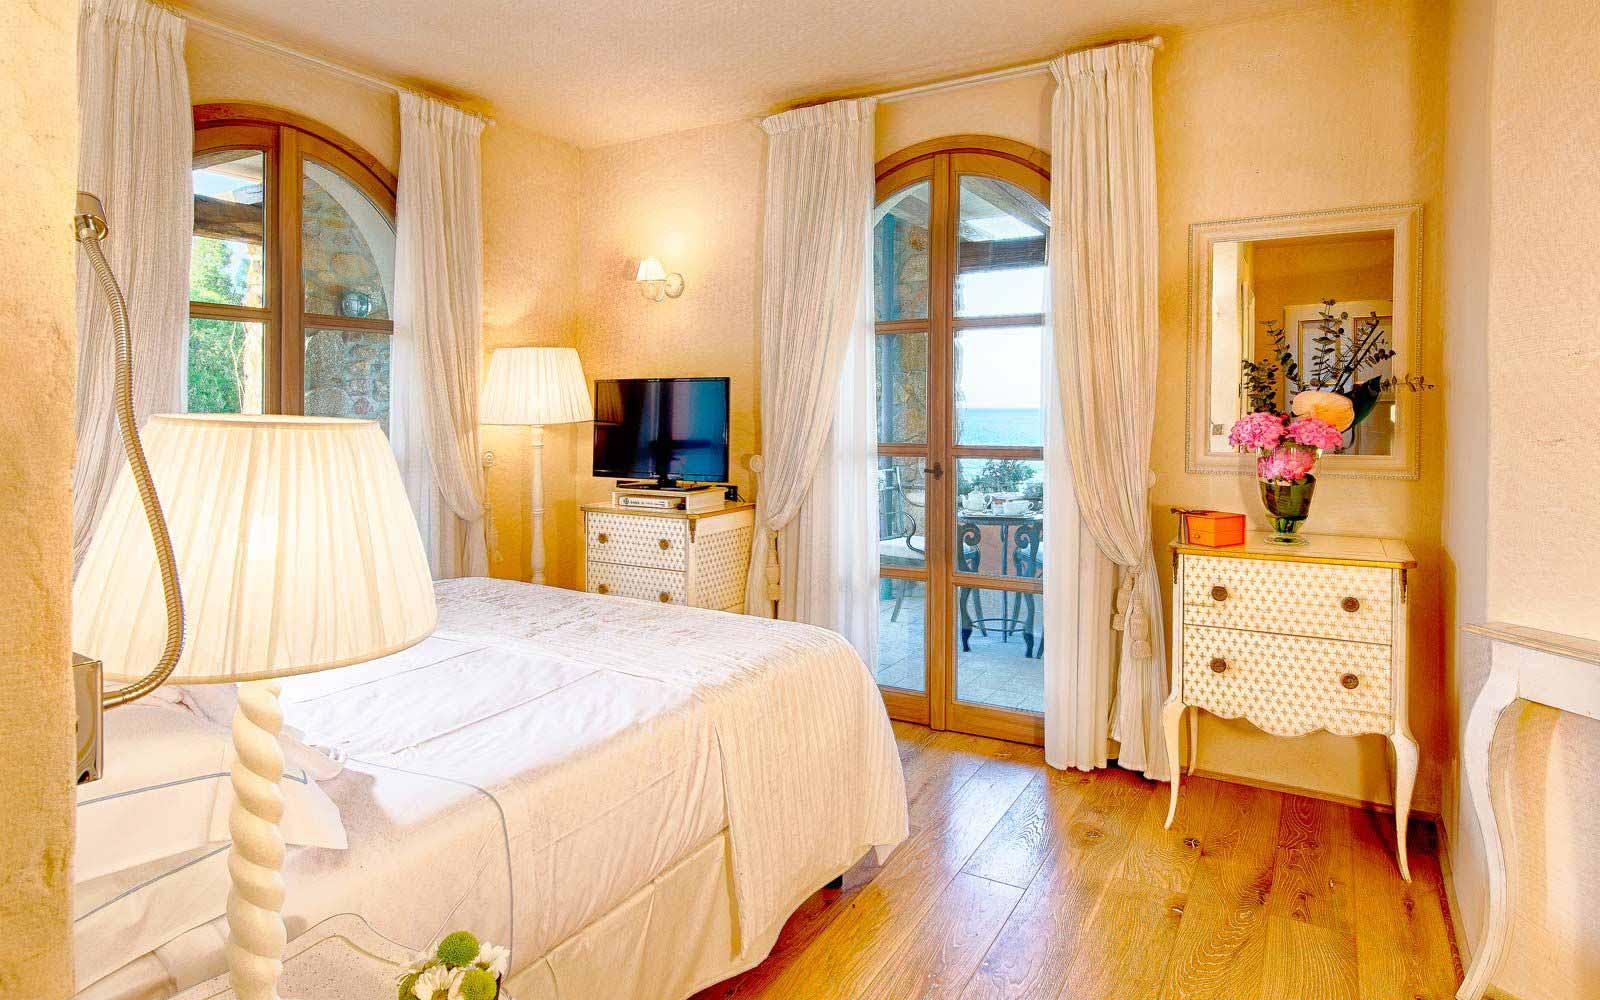 Deluxe room at the Hotel Villa del Re